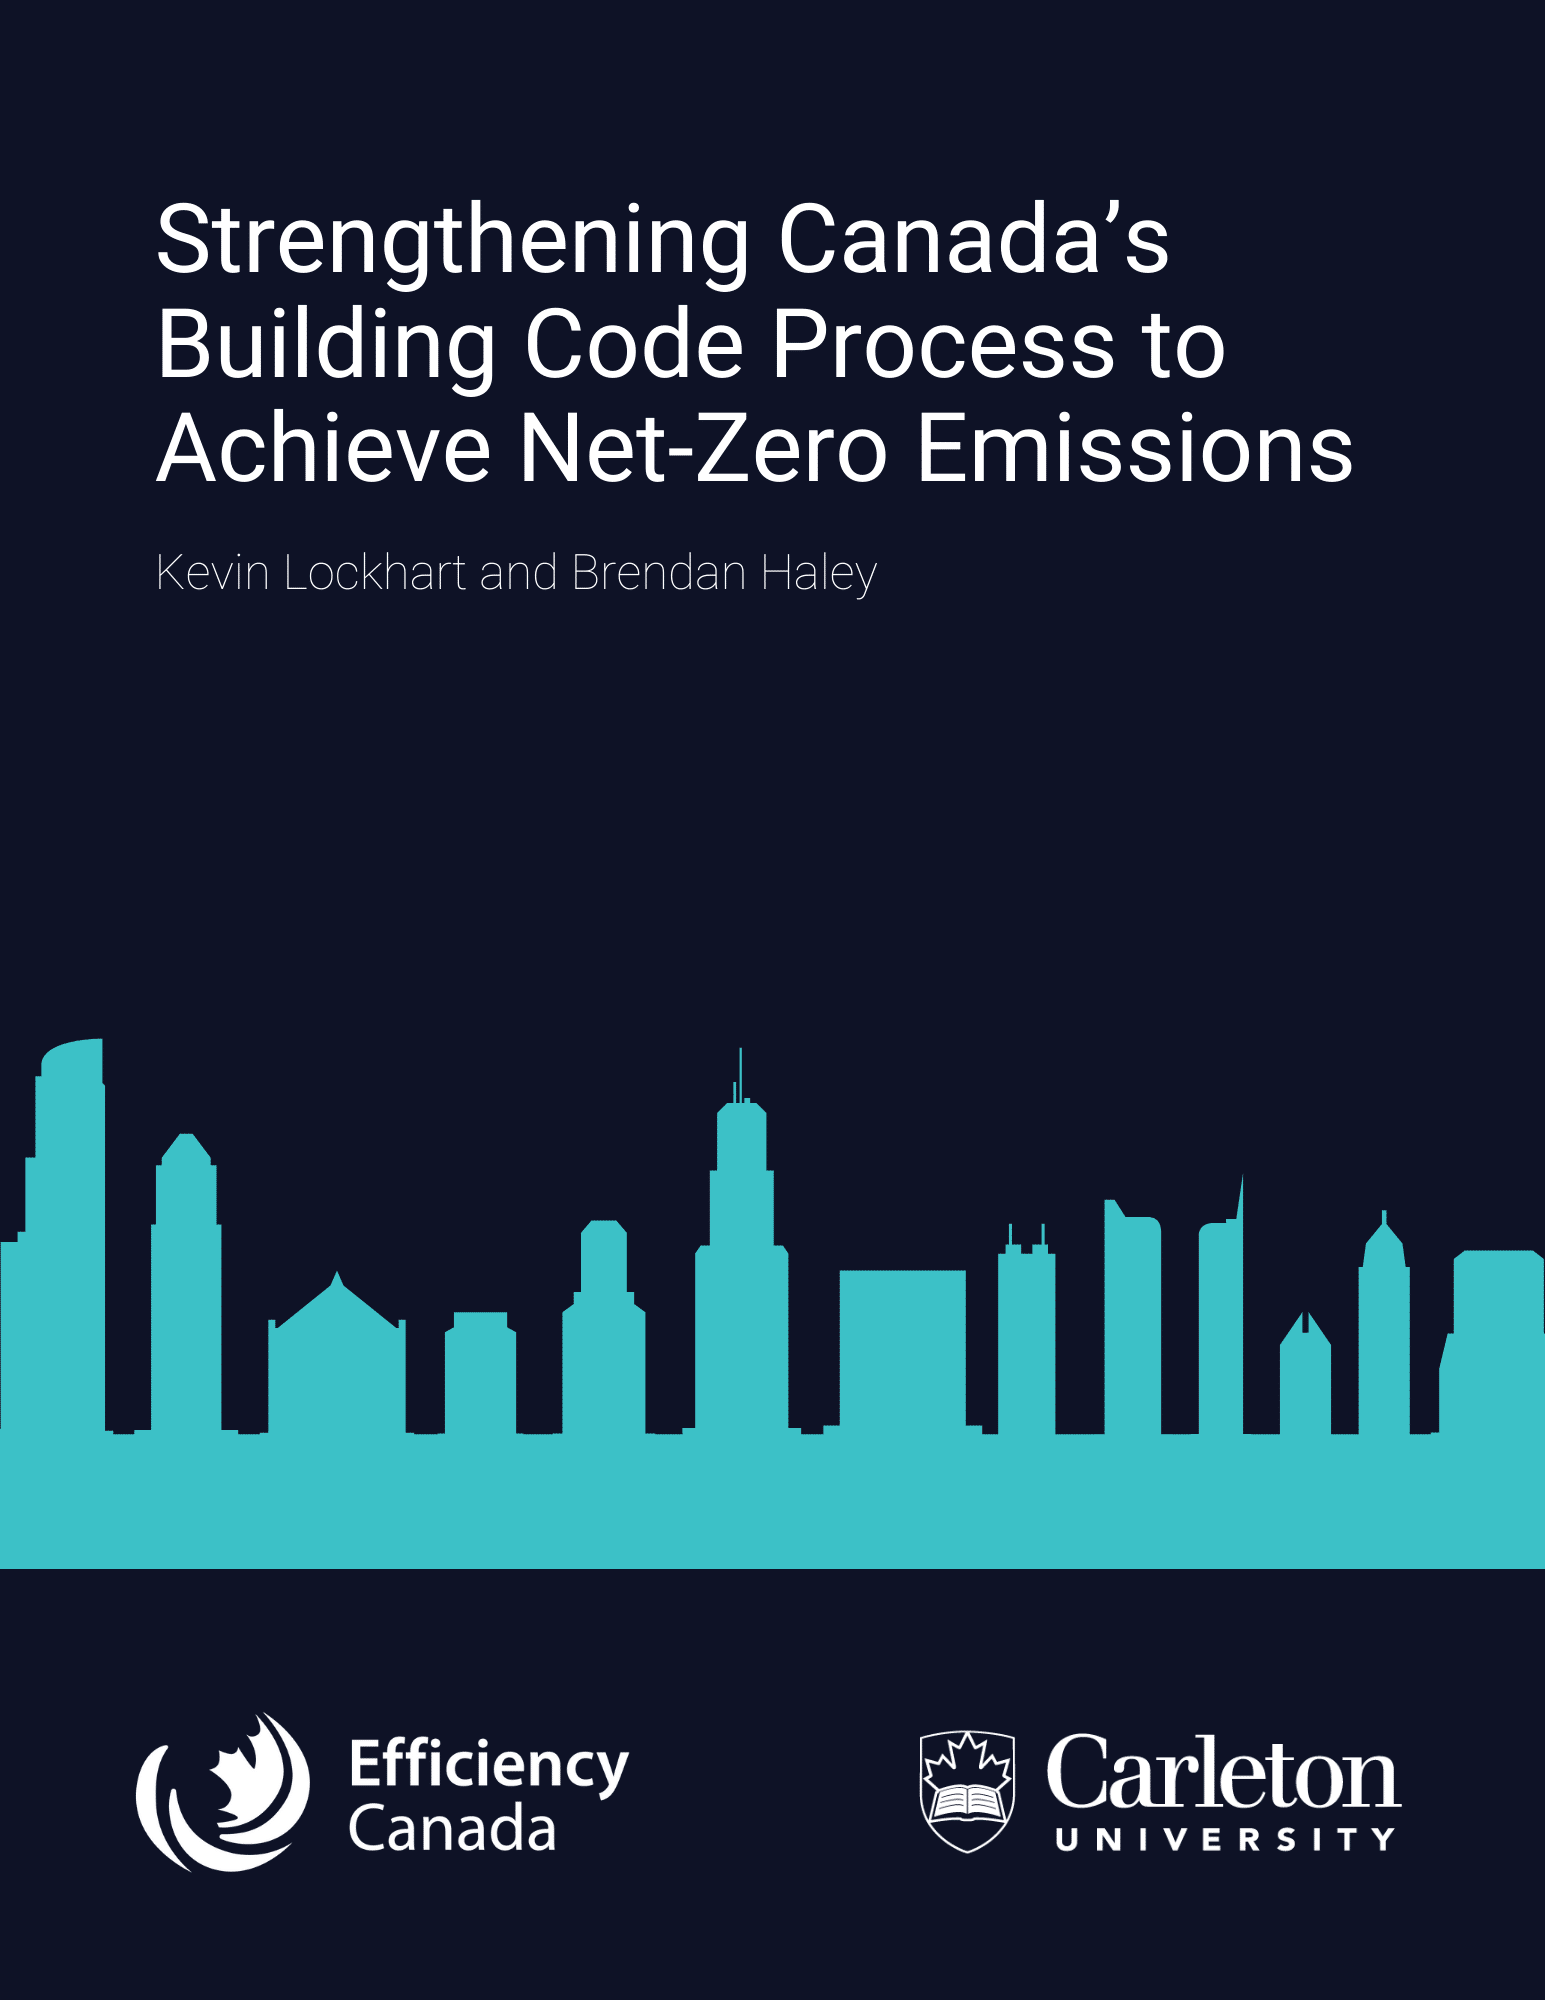 Strengthening Canada's Building Code Process to Achieve Net-Zero Emissions